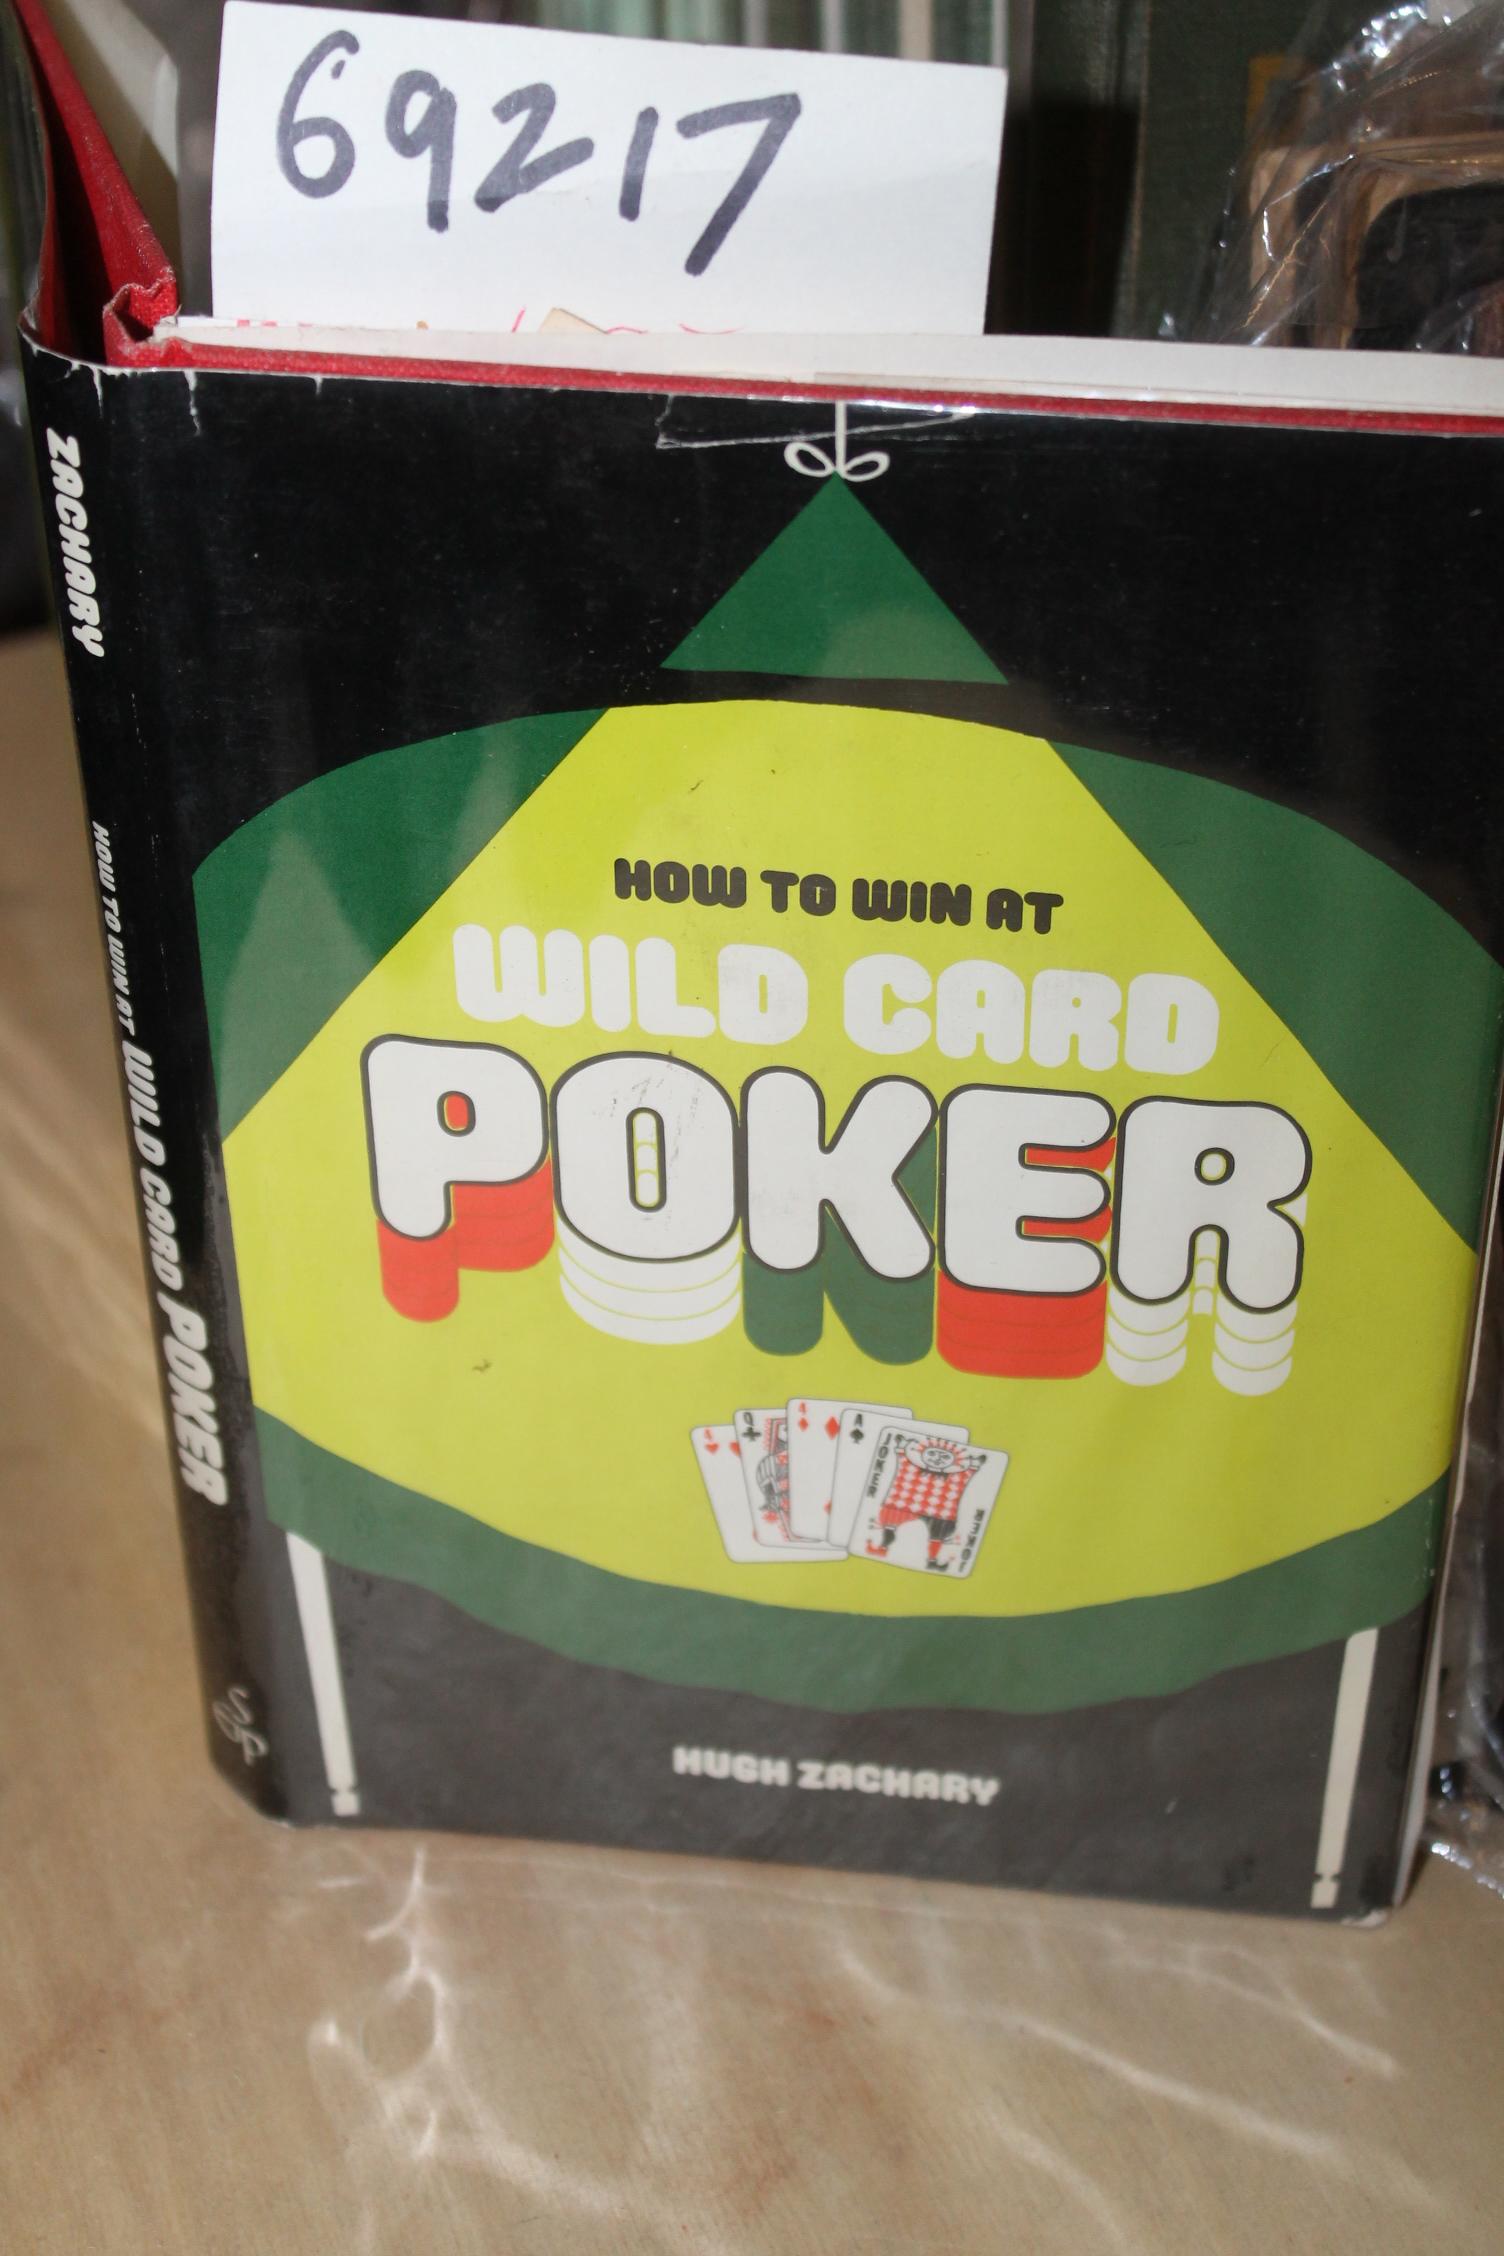 Zachary, Hugh: How to Win at Wild Card Poker